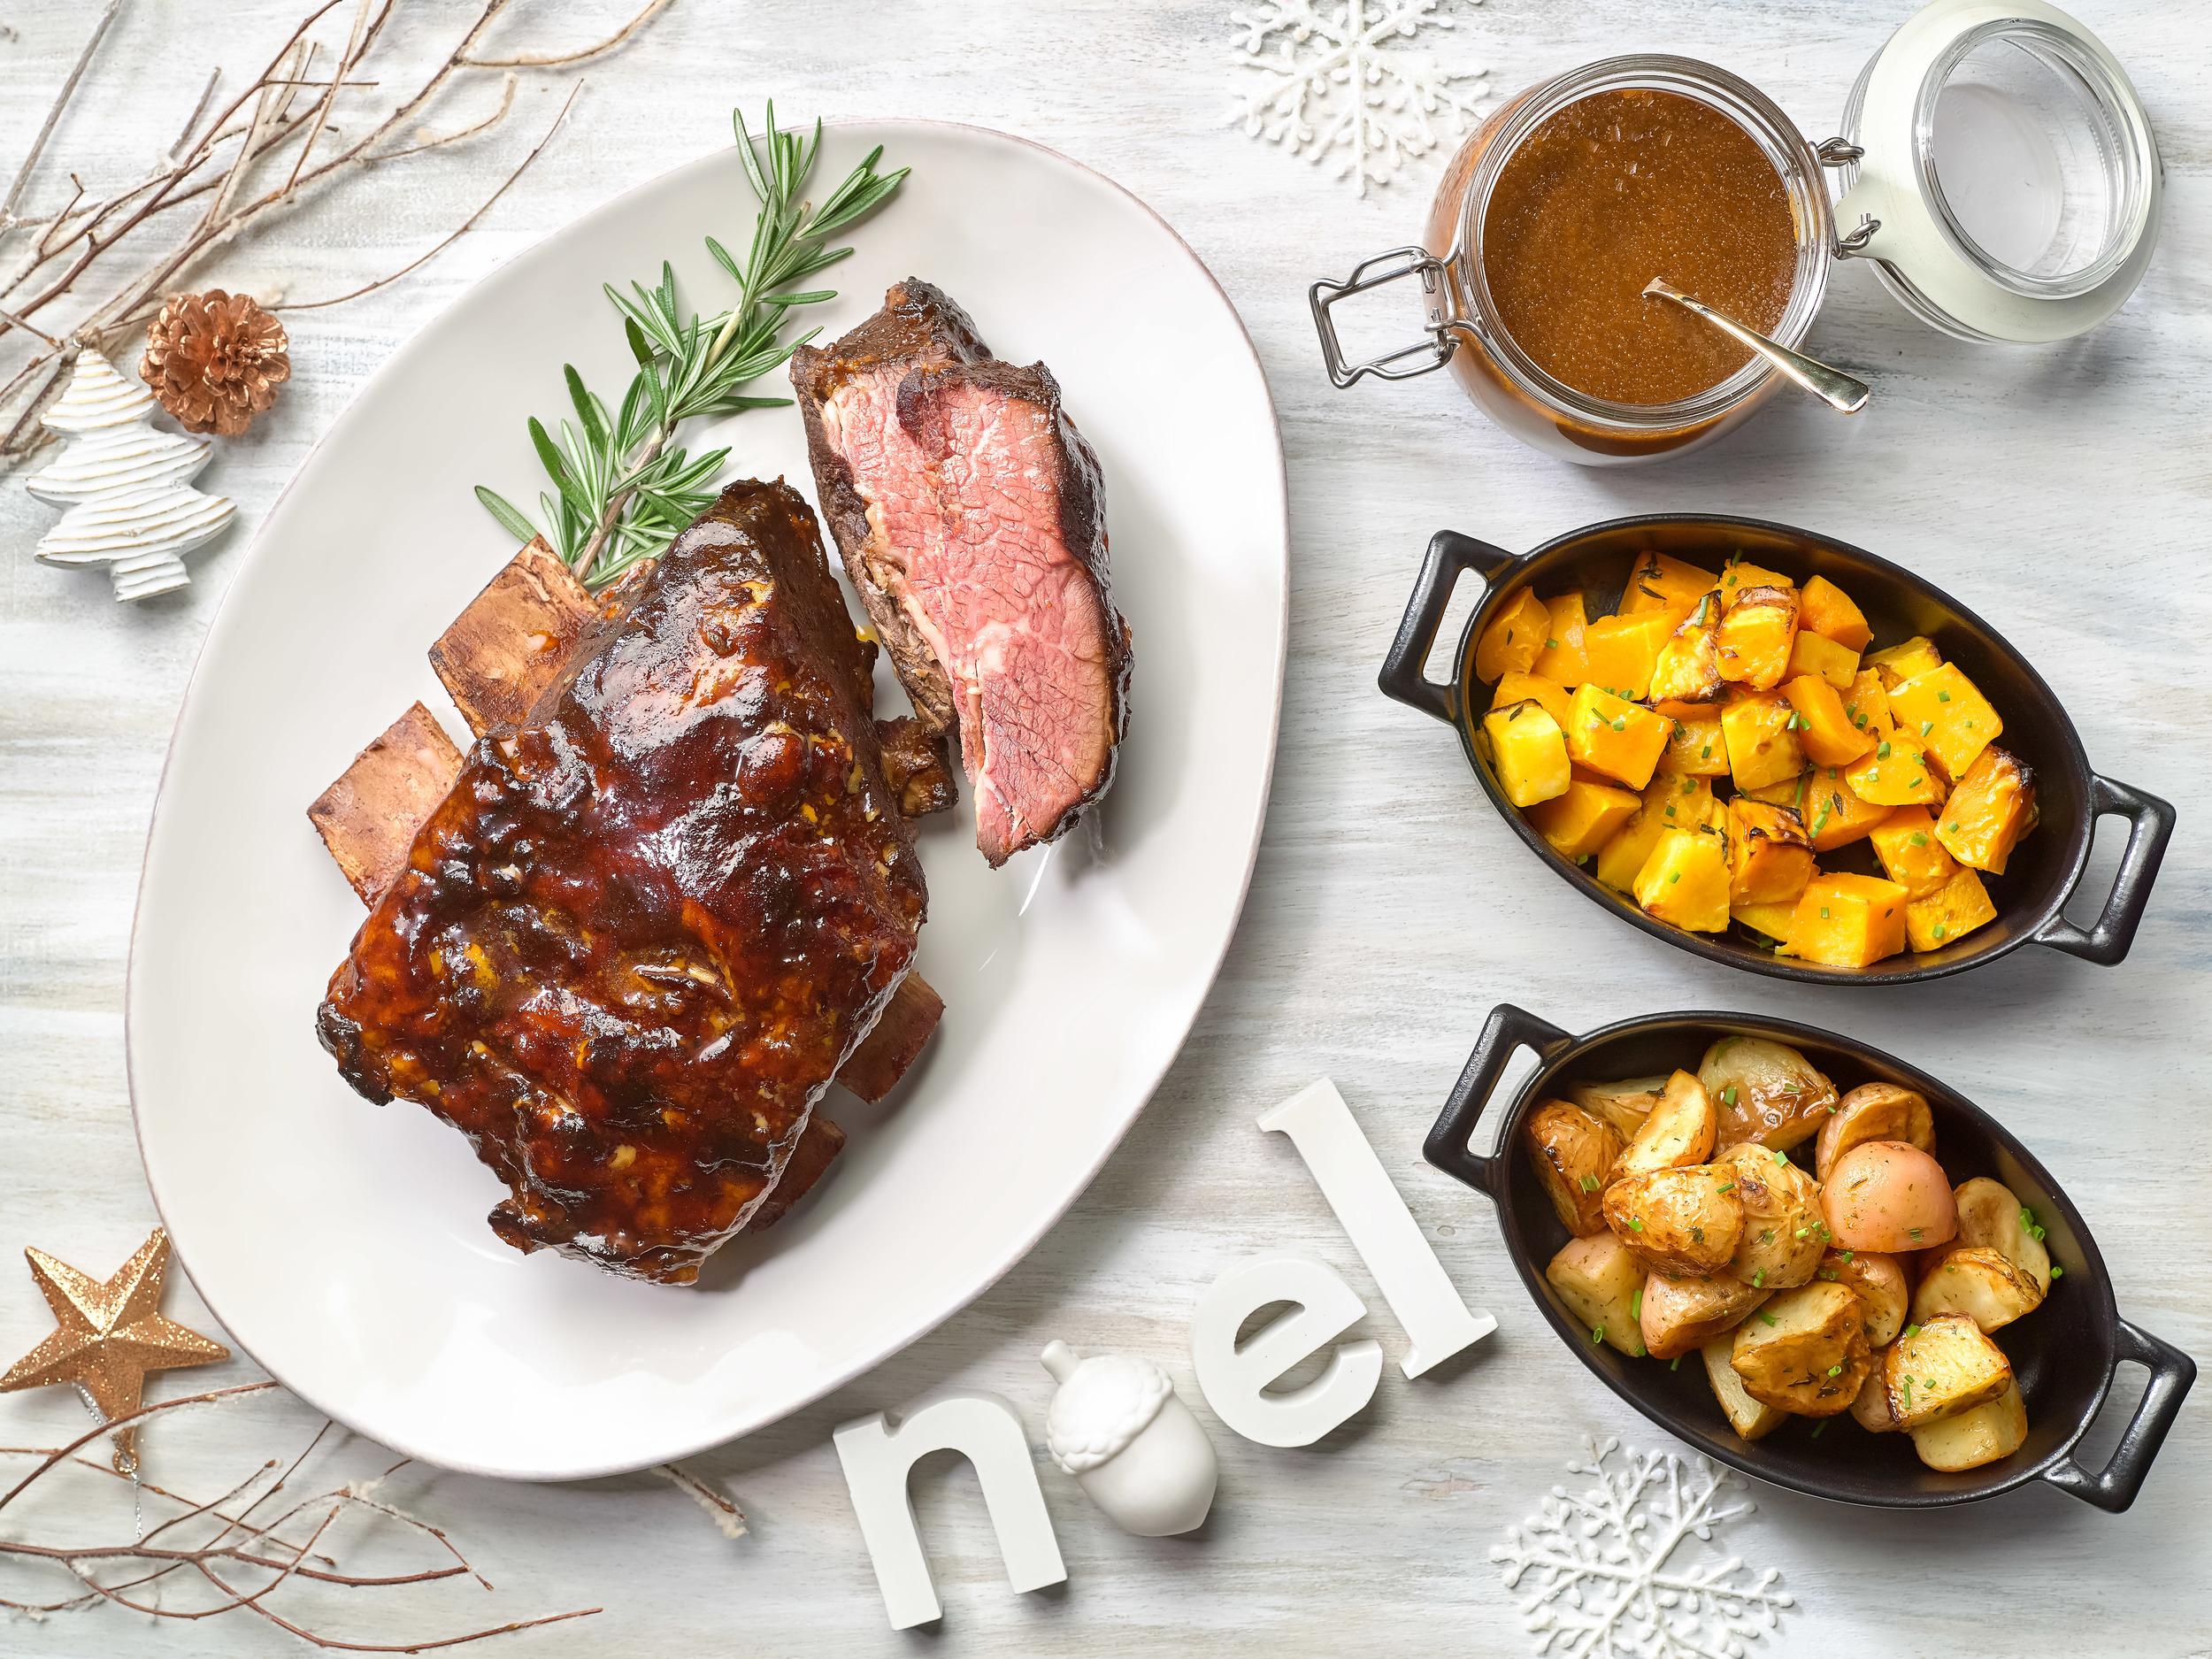 Roasted Texas BBQ Beef Short-Rib | Photo Credit:  Crowne Plaza Changi Airport